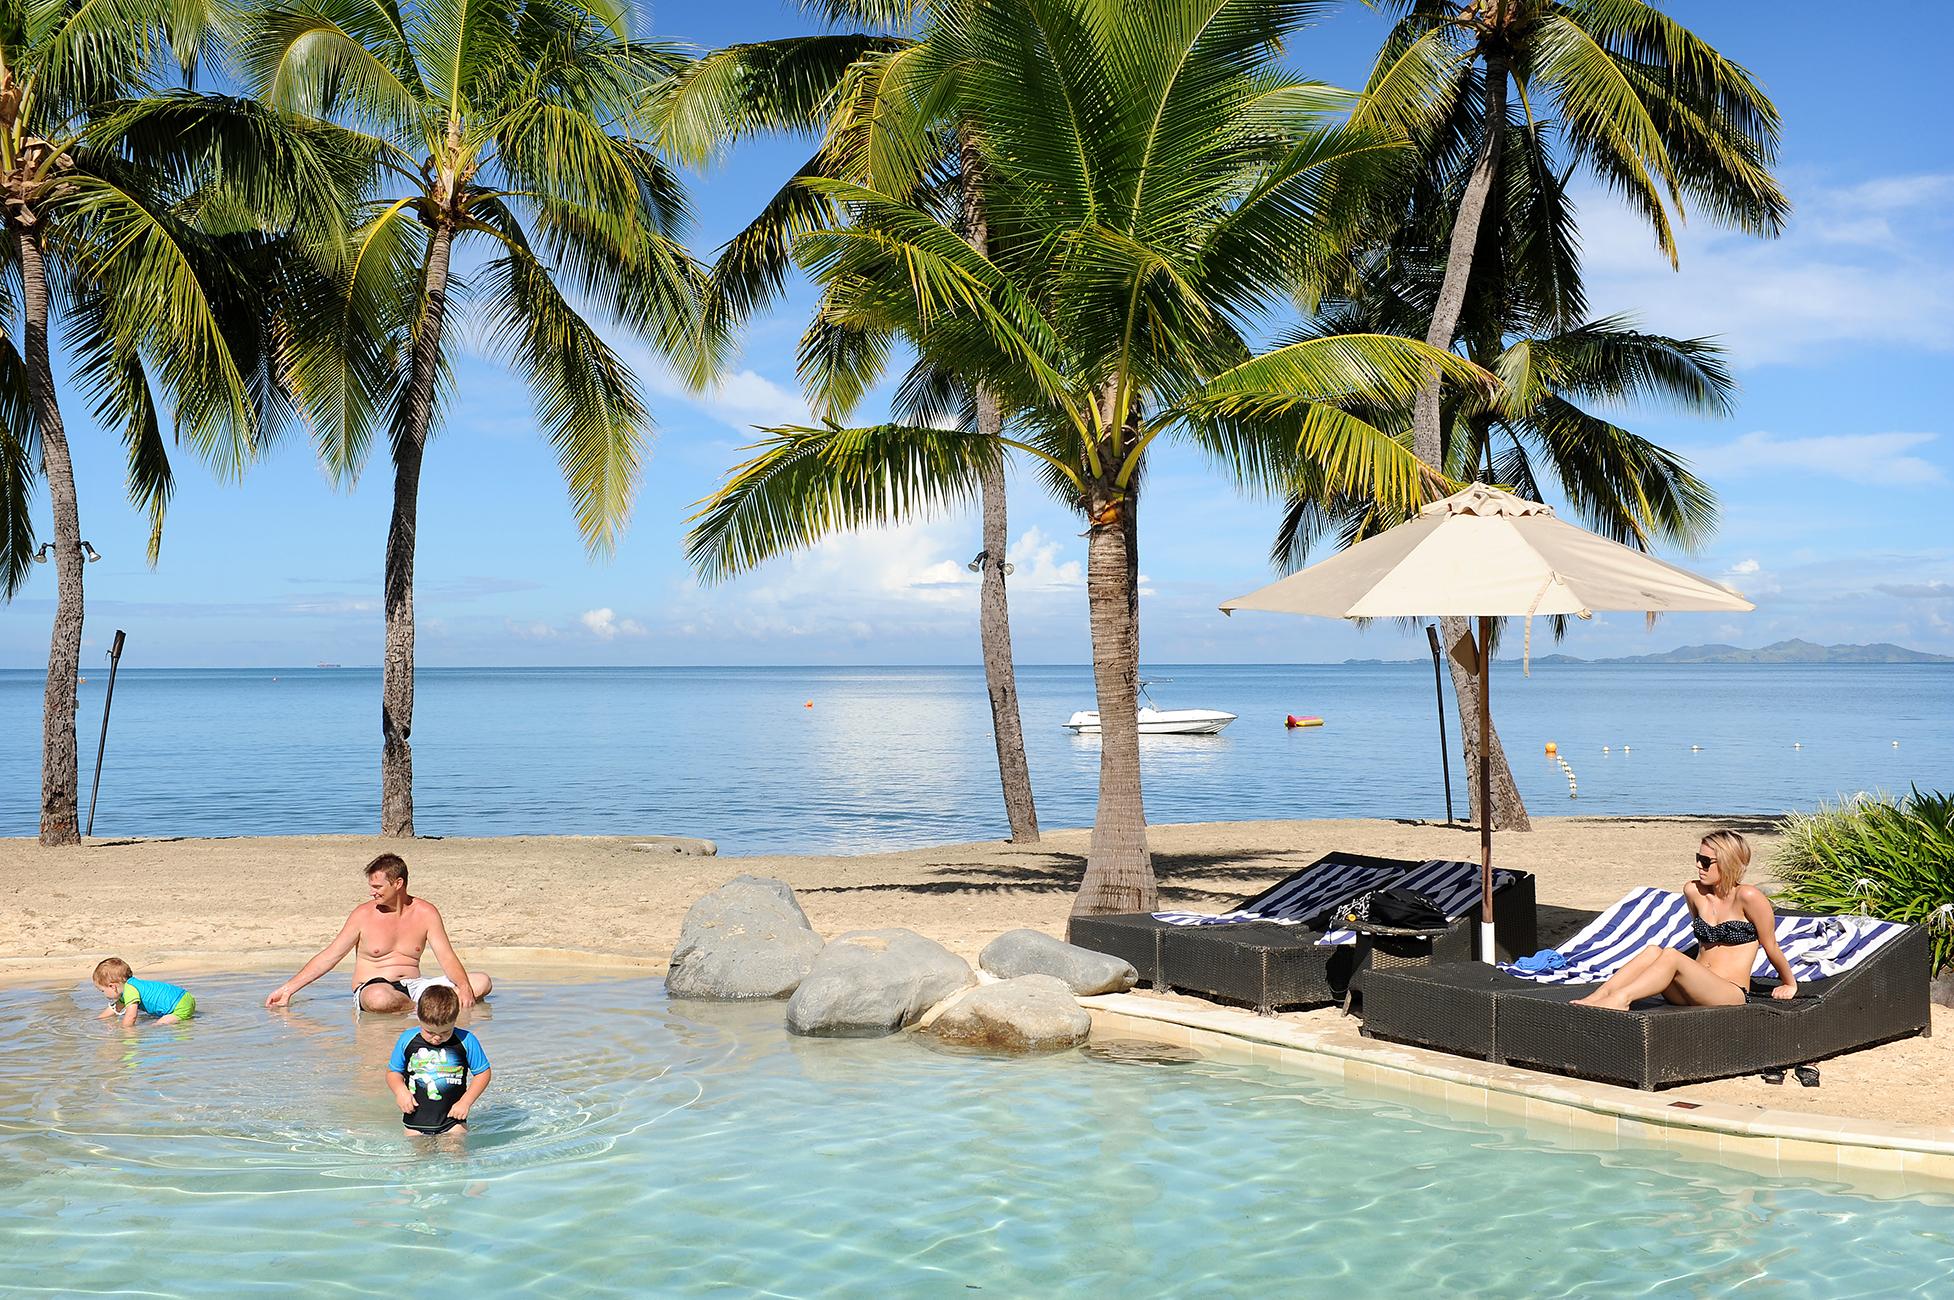 Uima-allas, Fidzi, meri, matkablogi, matka, perhematka